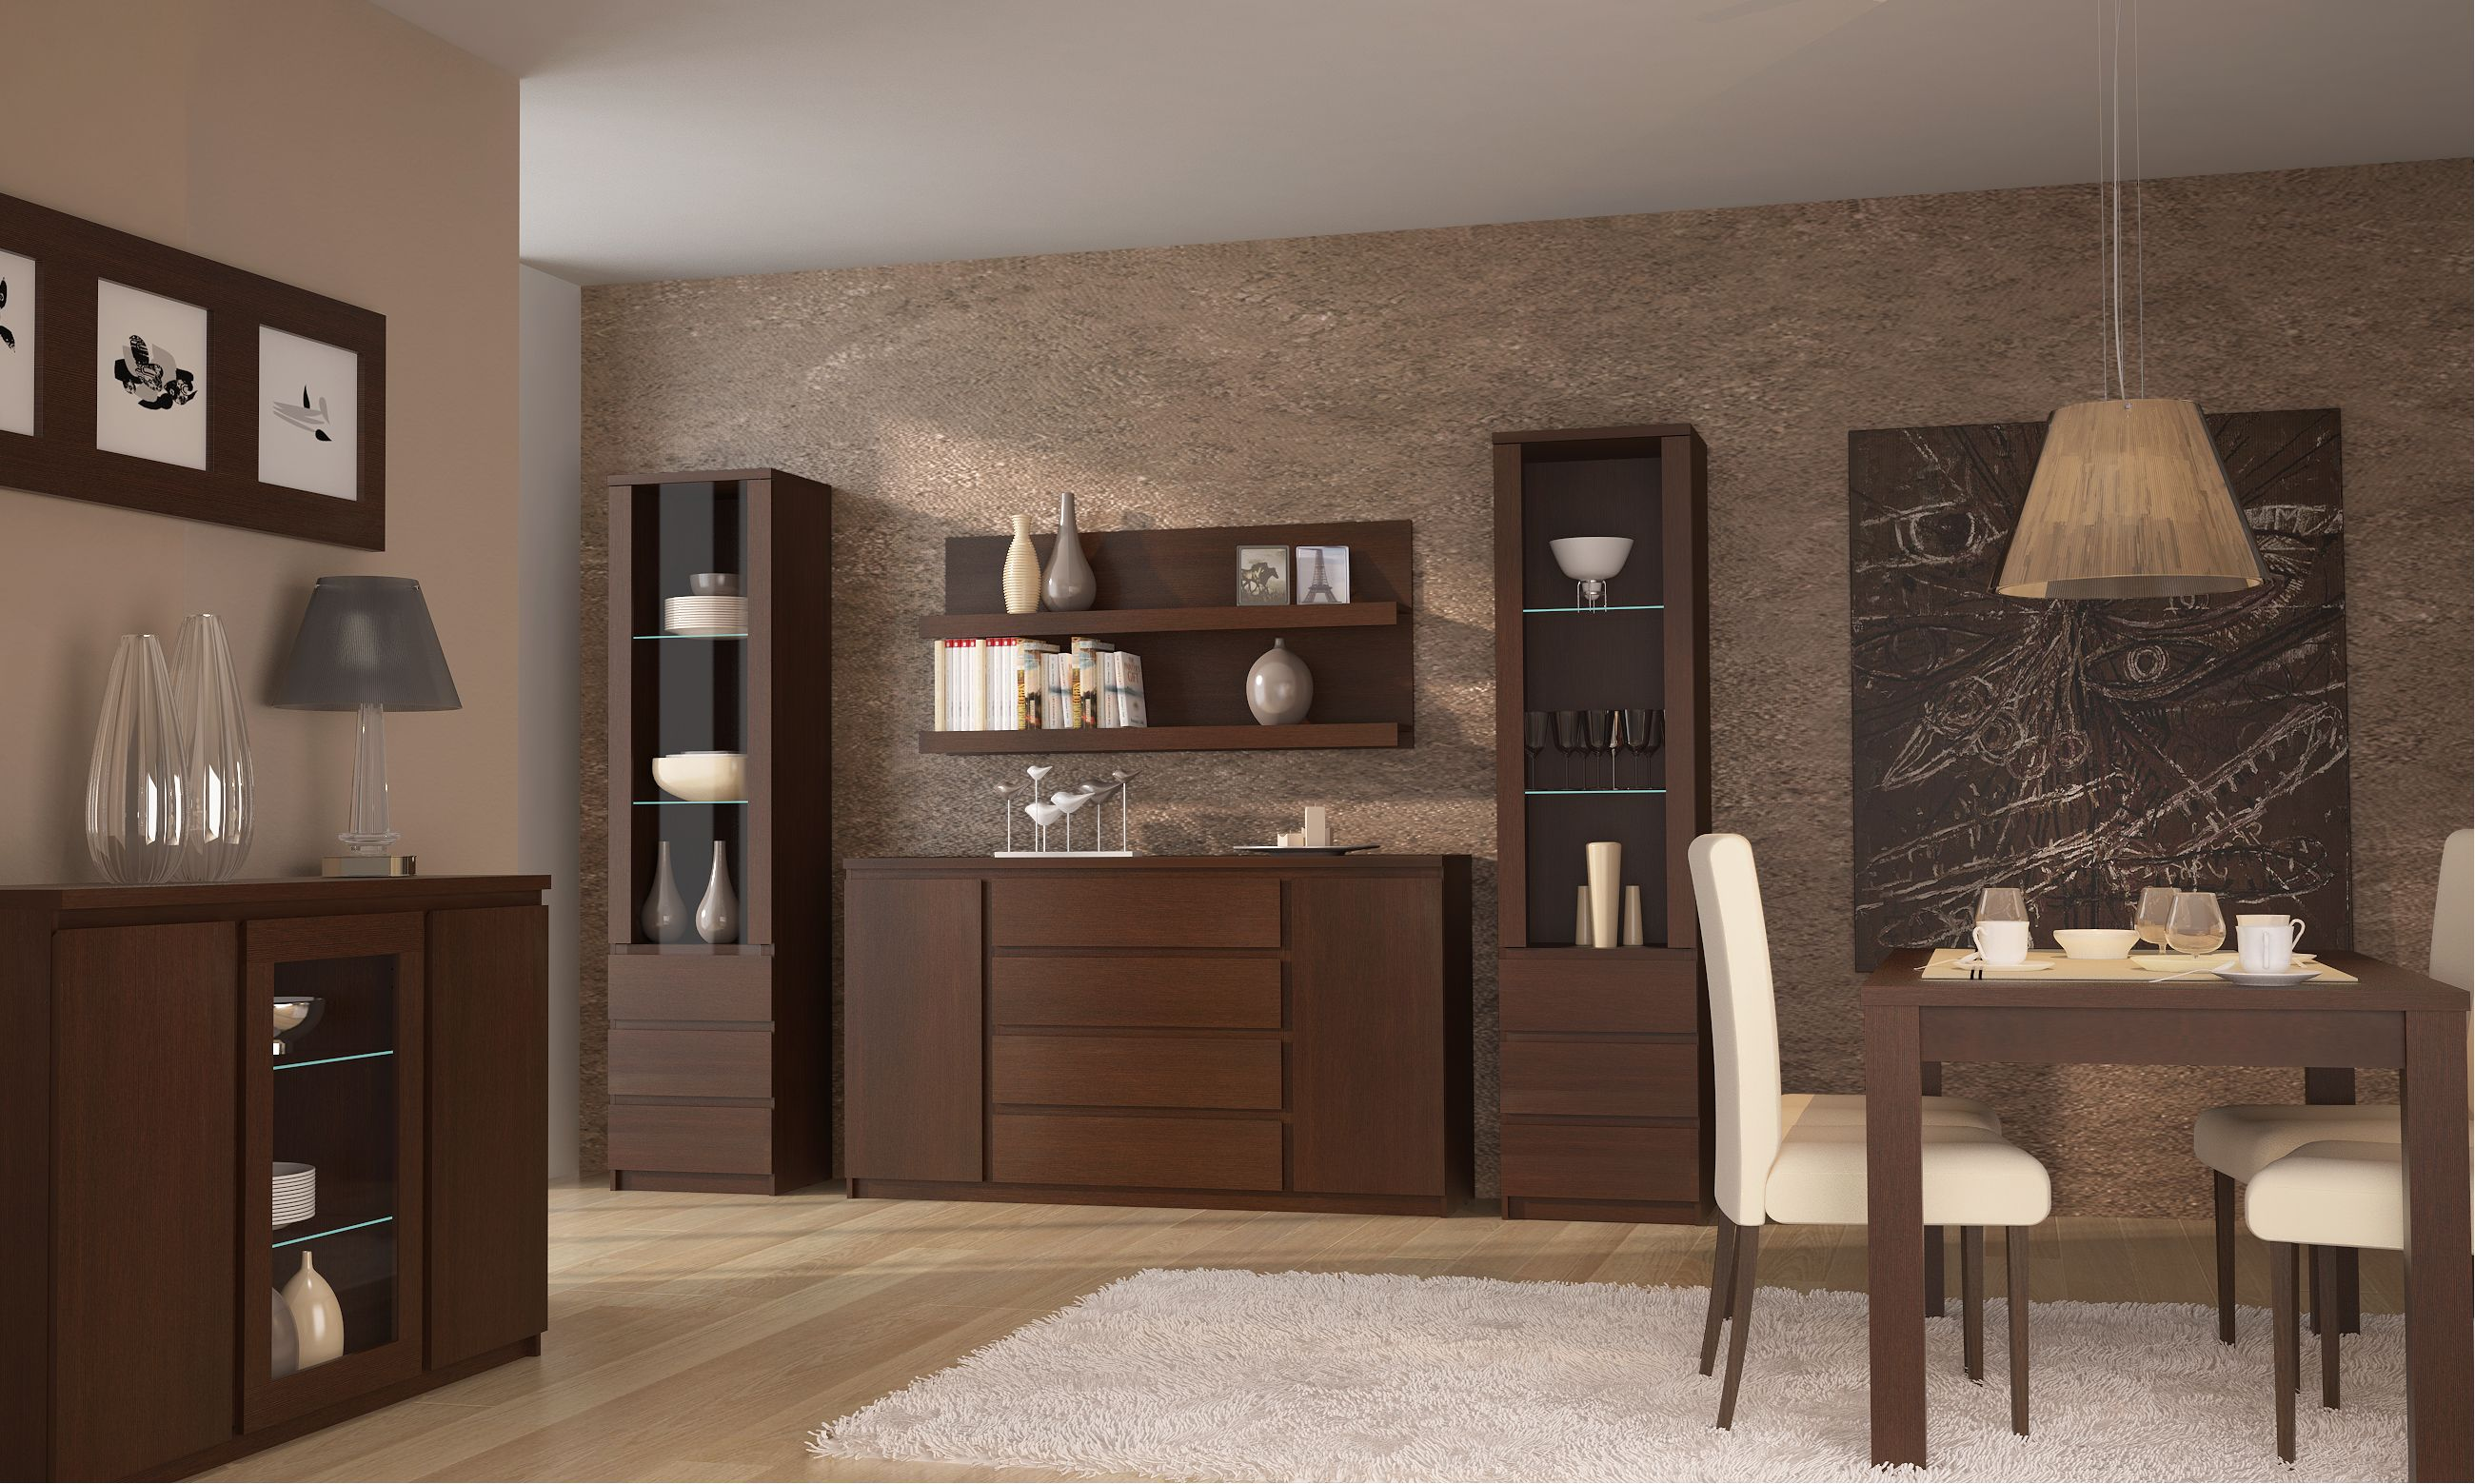 Pello 1 | Modern wall units, Living room wall units and Modern wall